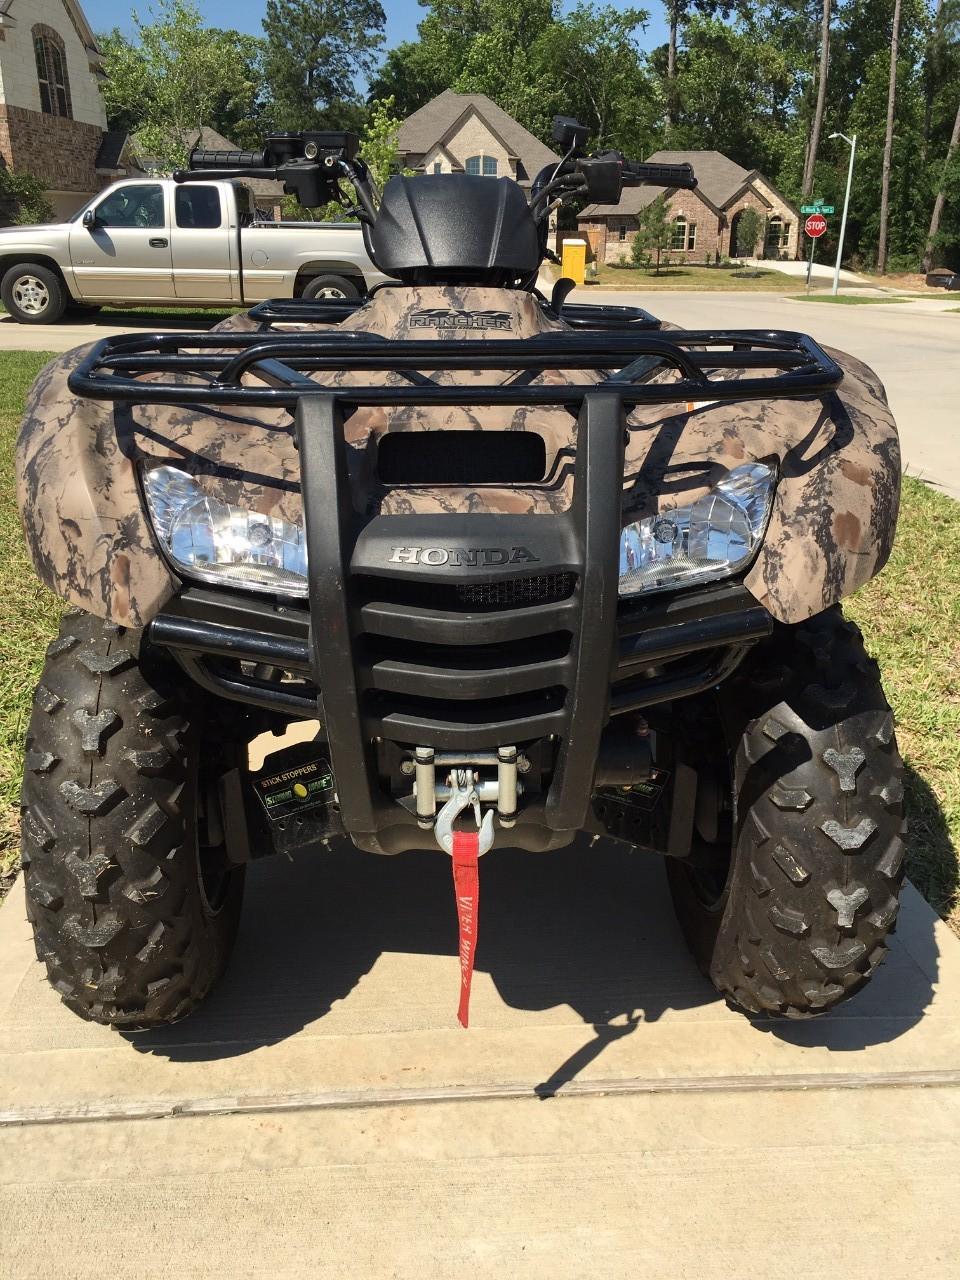 135,348 S THREE SEATER ATVs For Sale - ATV Trader